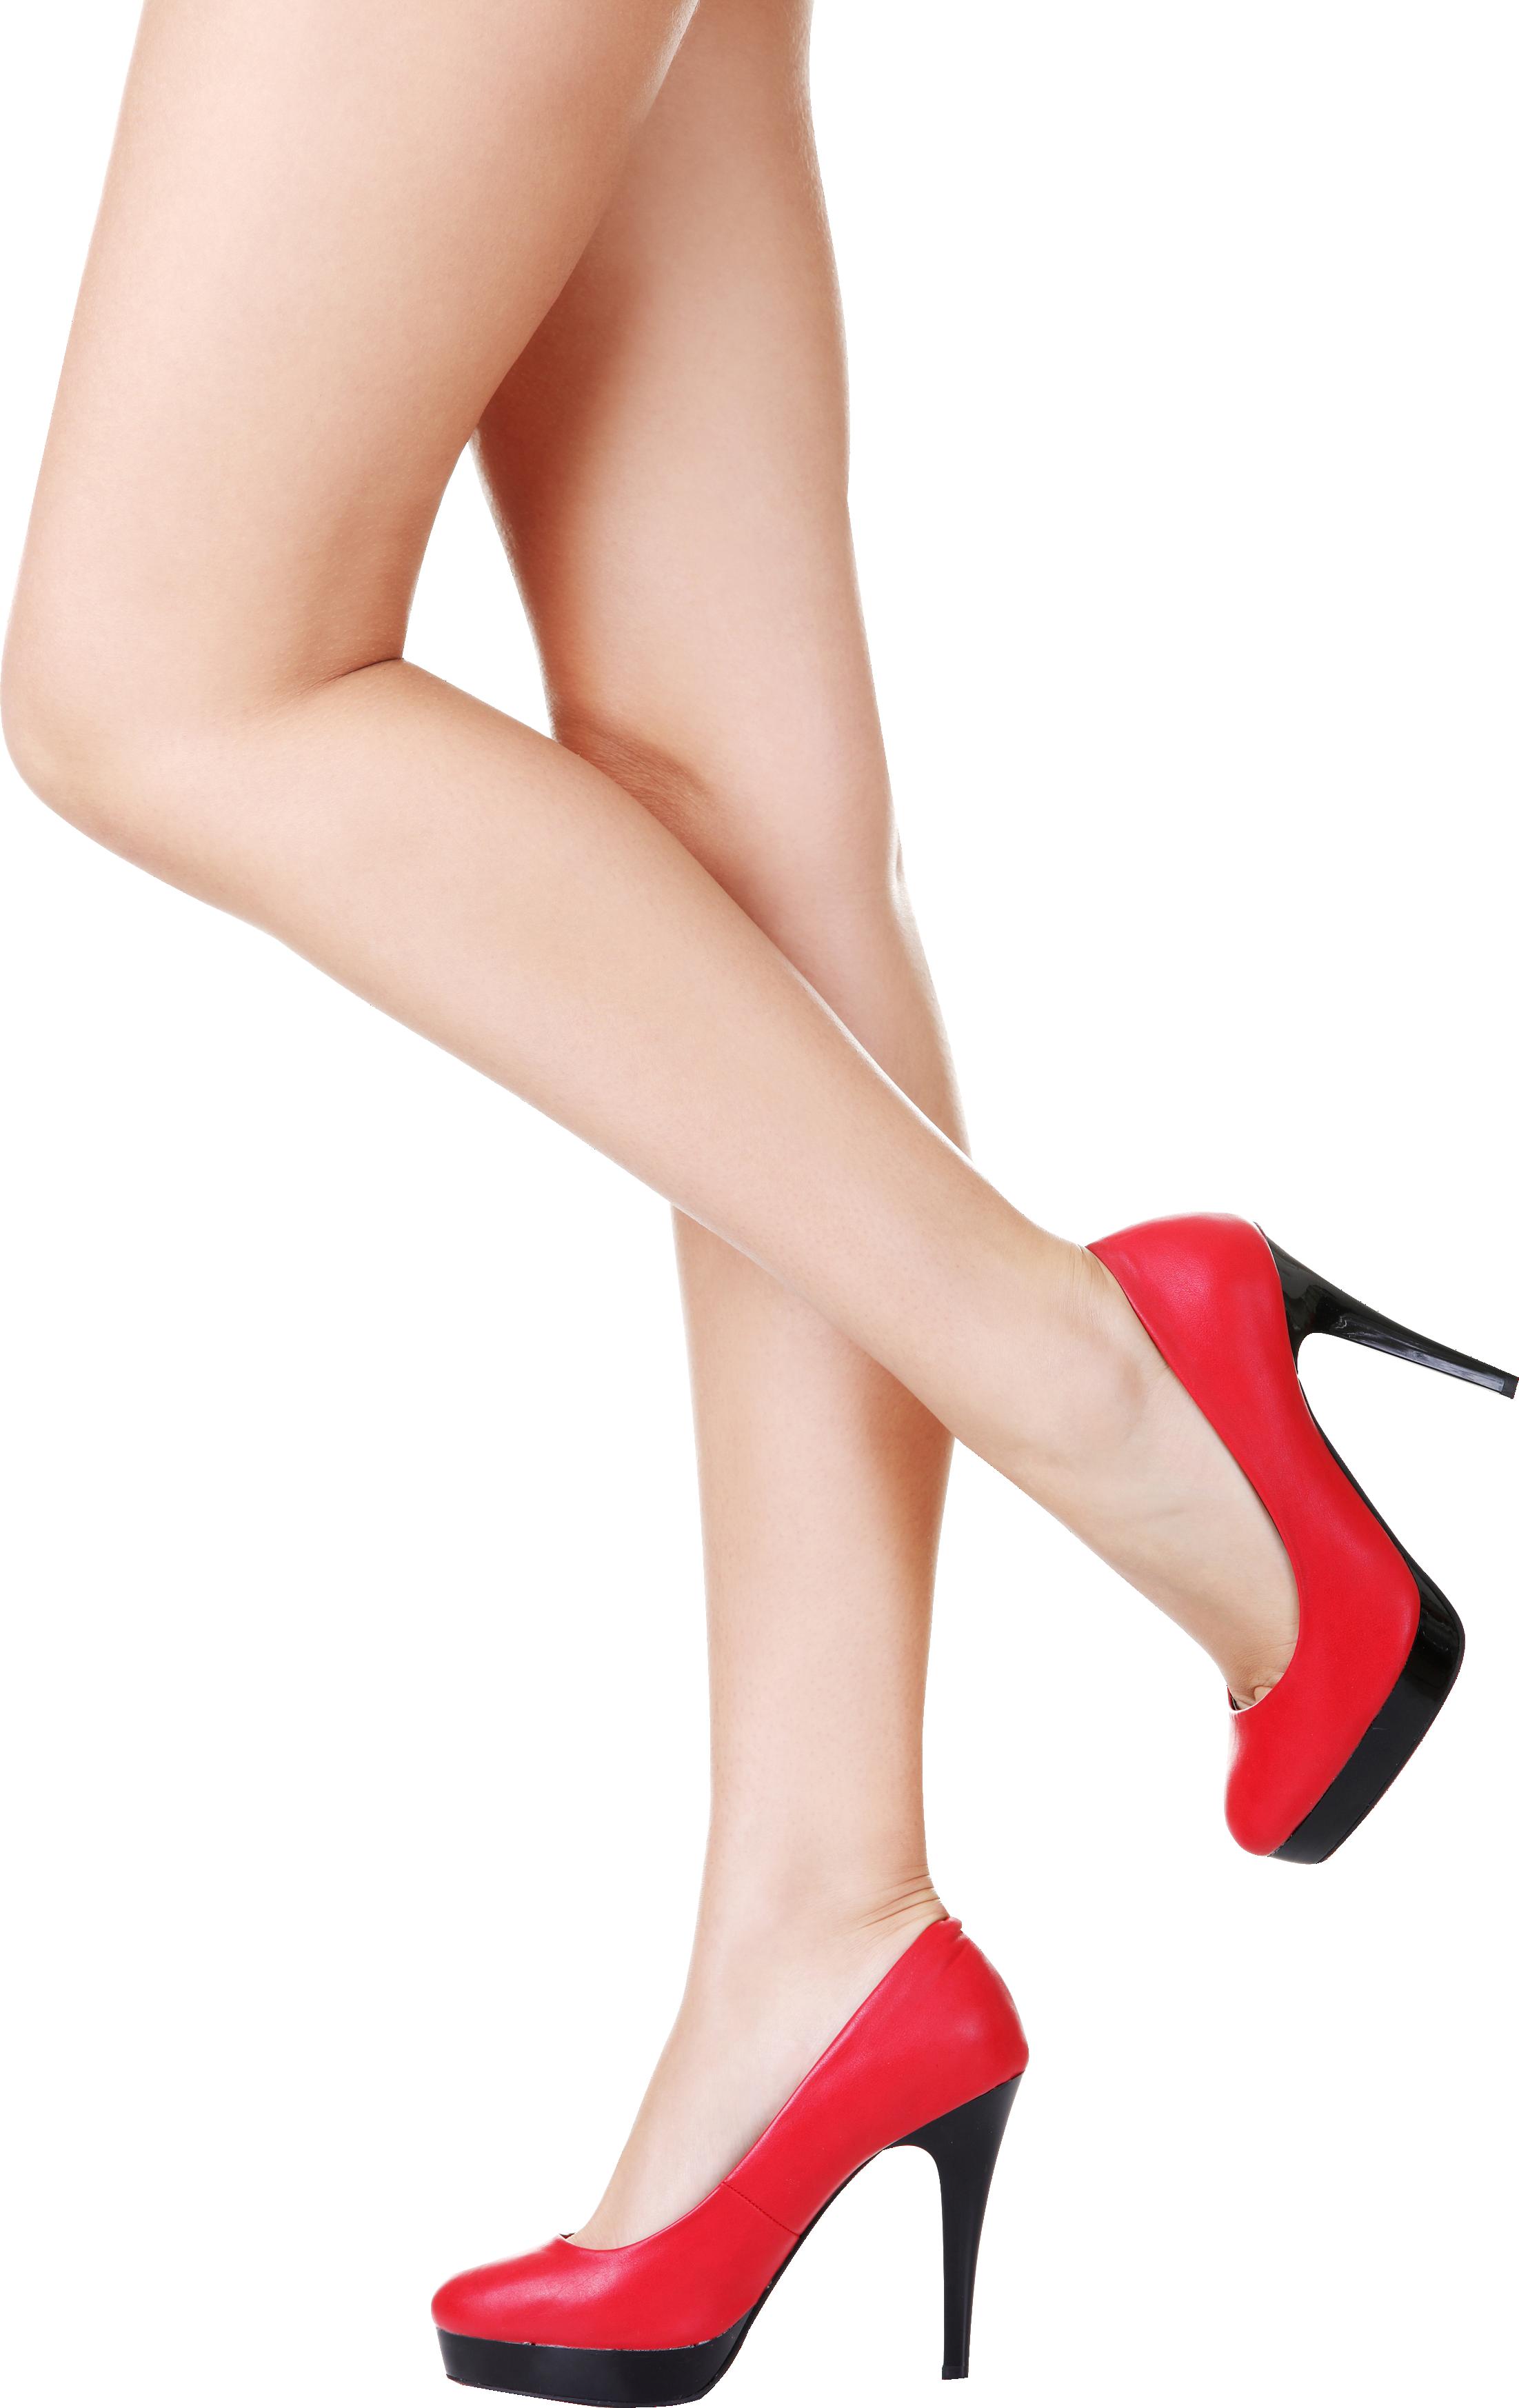 Legs clipart women's Women free download images image